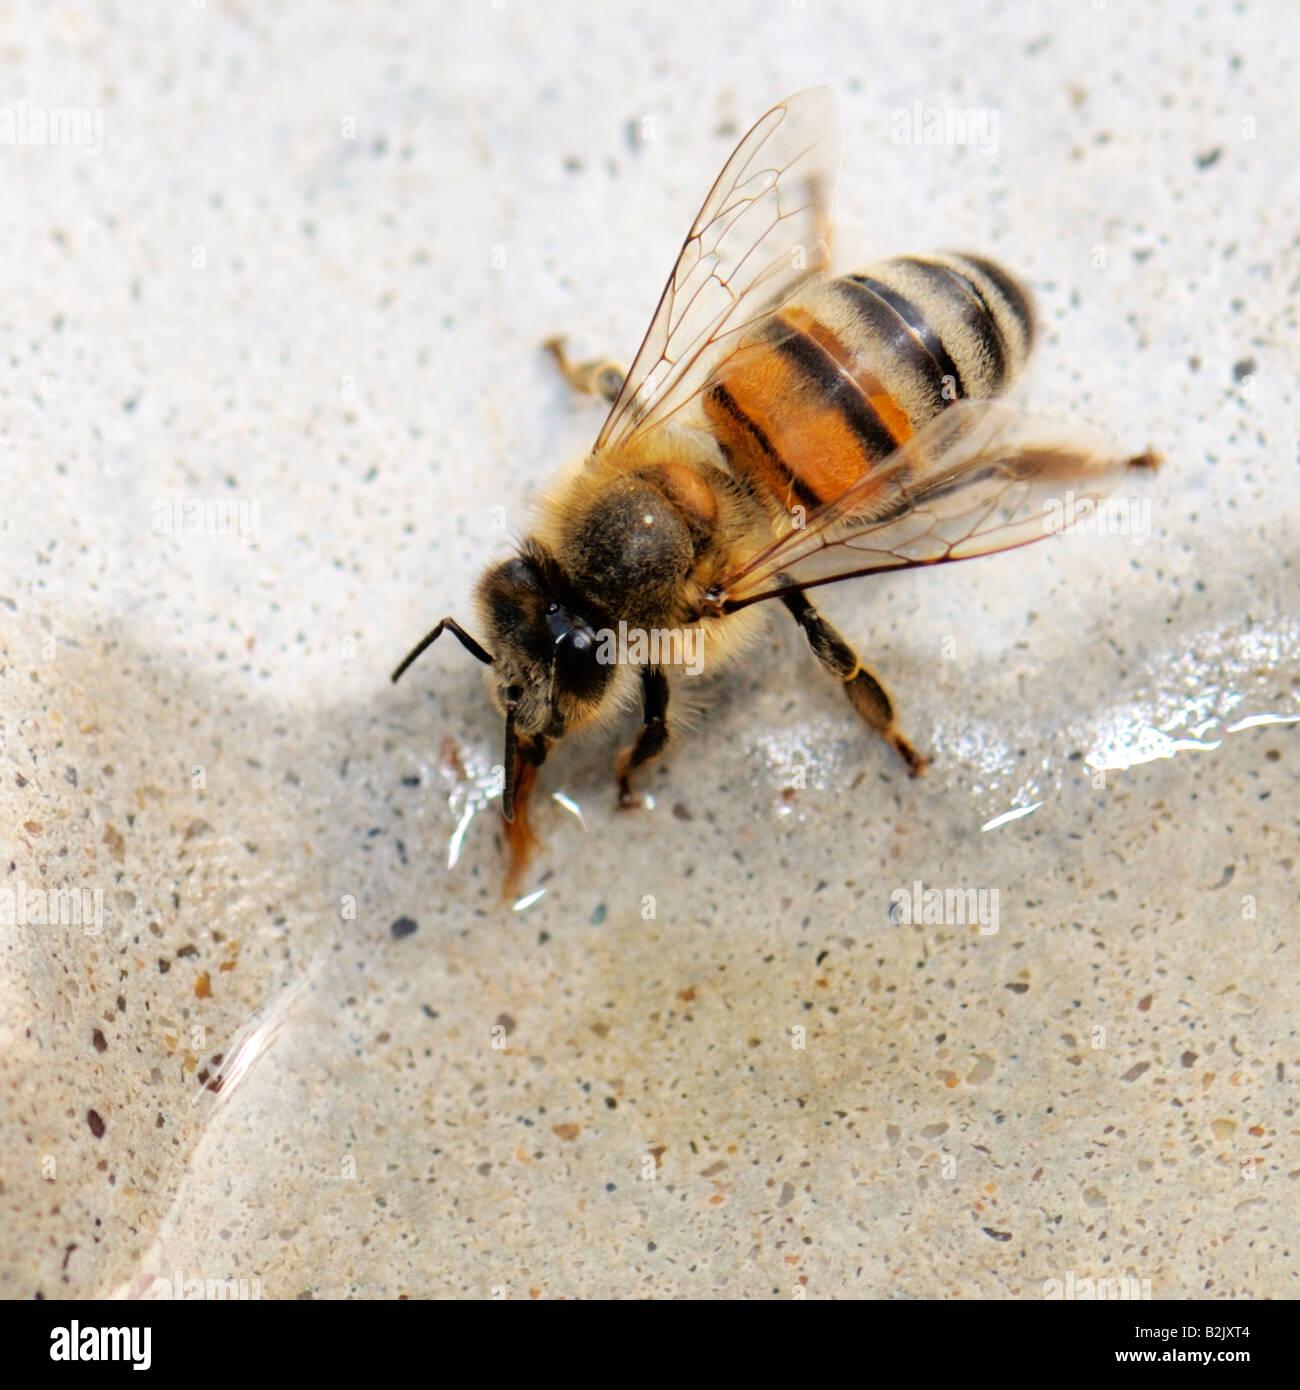 A single Honey Bee ( Apis mellifera) drinks water from a bird bath on a 100 degree summer day. Oklahoma, USA. - Stock Image